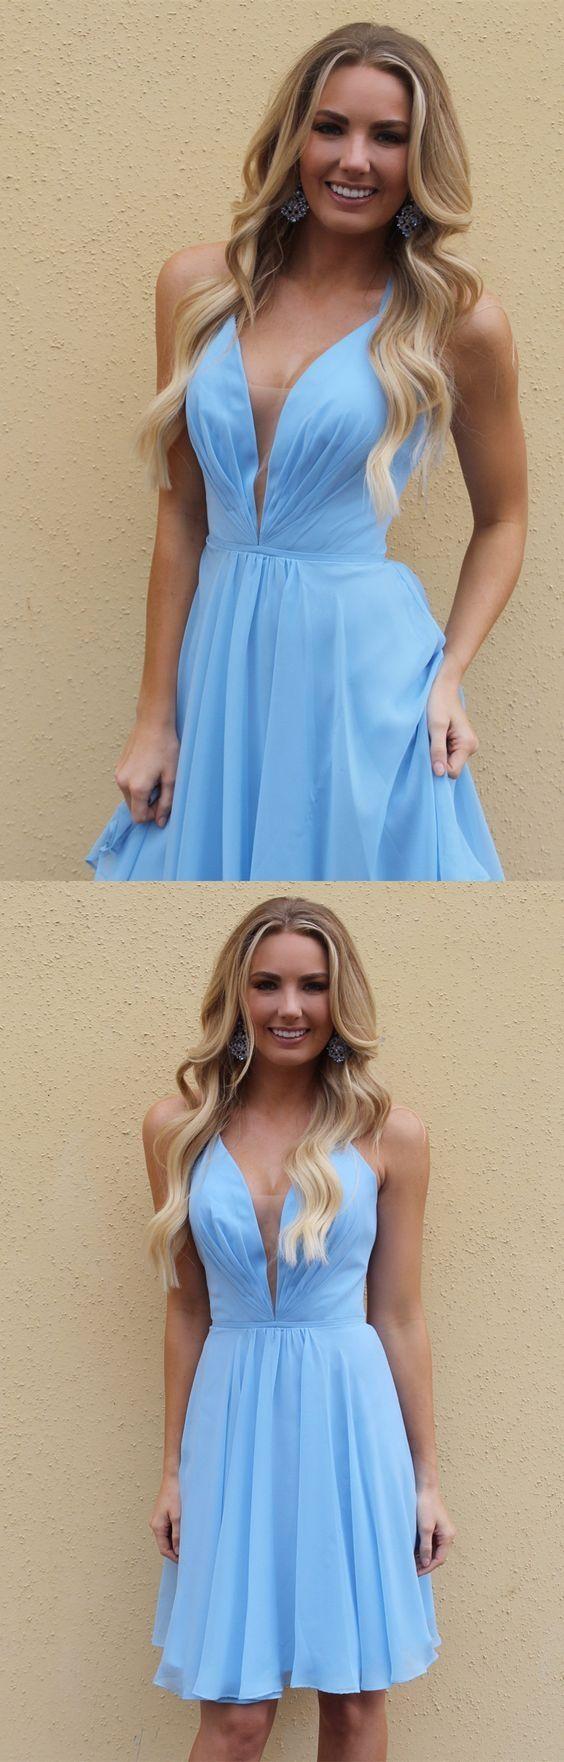 584dd221c237 A-Line Spaghetti Straps Above-Knee Light Blue Chiffon Homecoming Dress |  fashion dresses | Pinterest | Homecoming dresses, Short party dresses and  ...